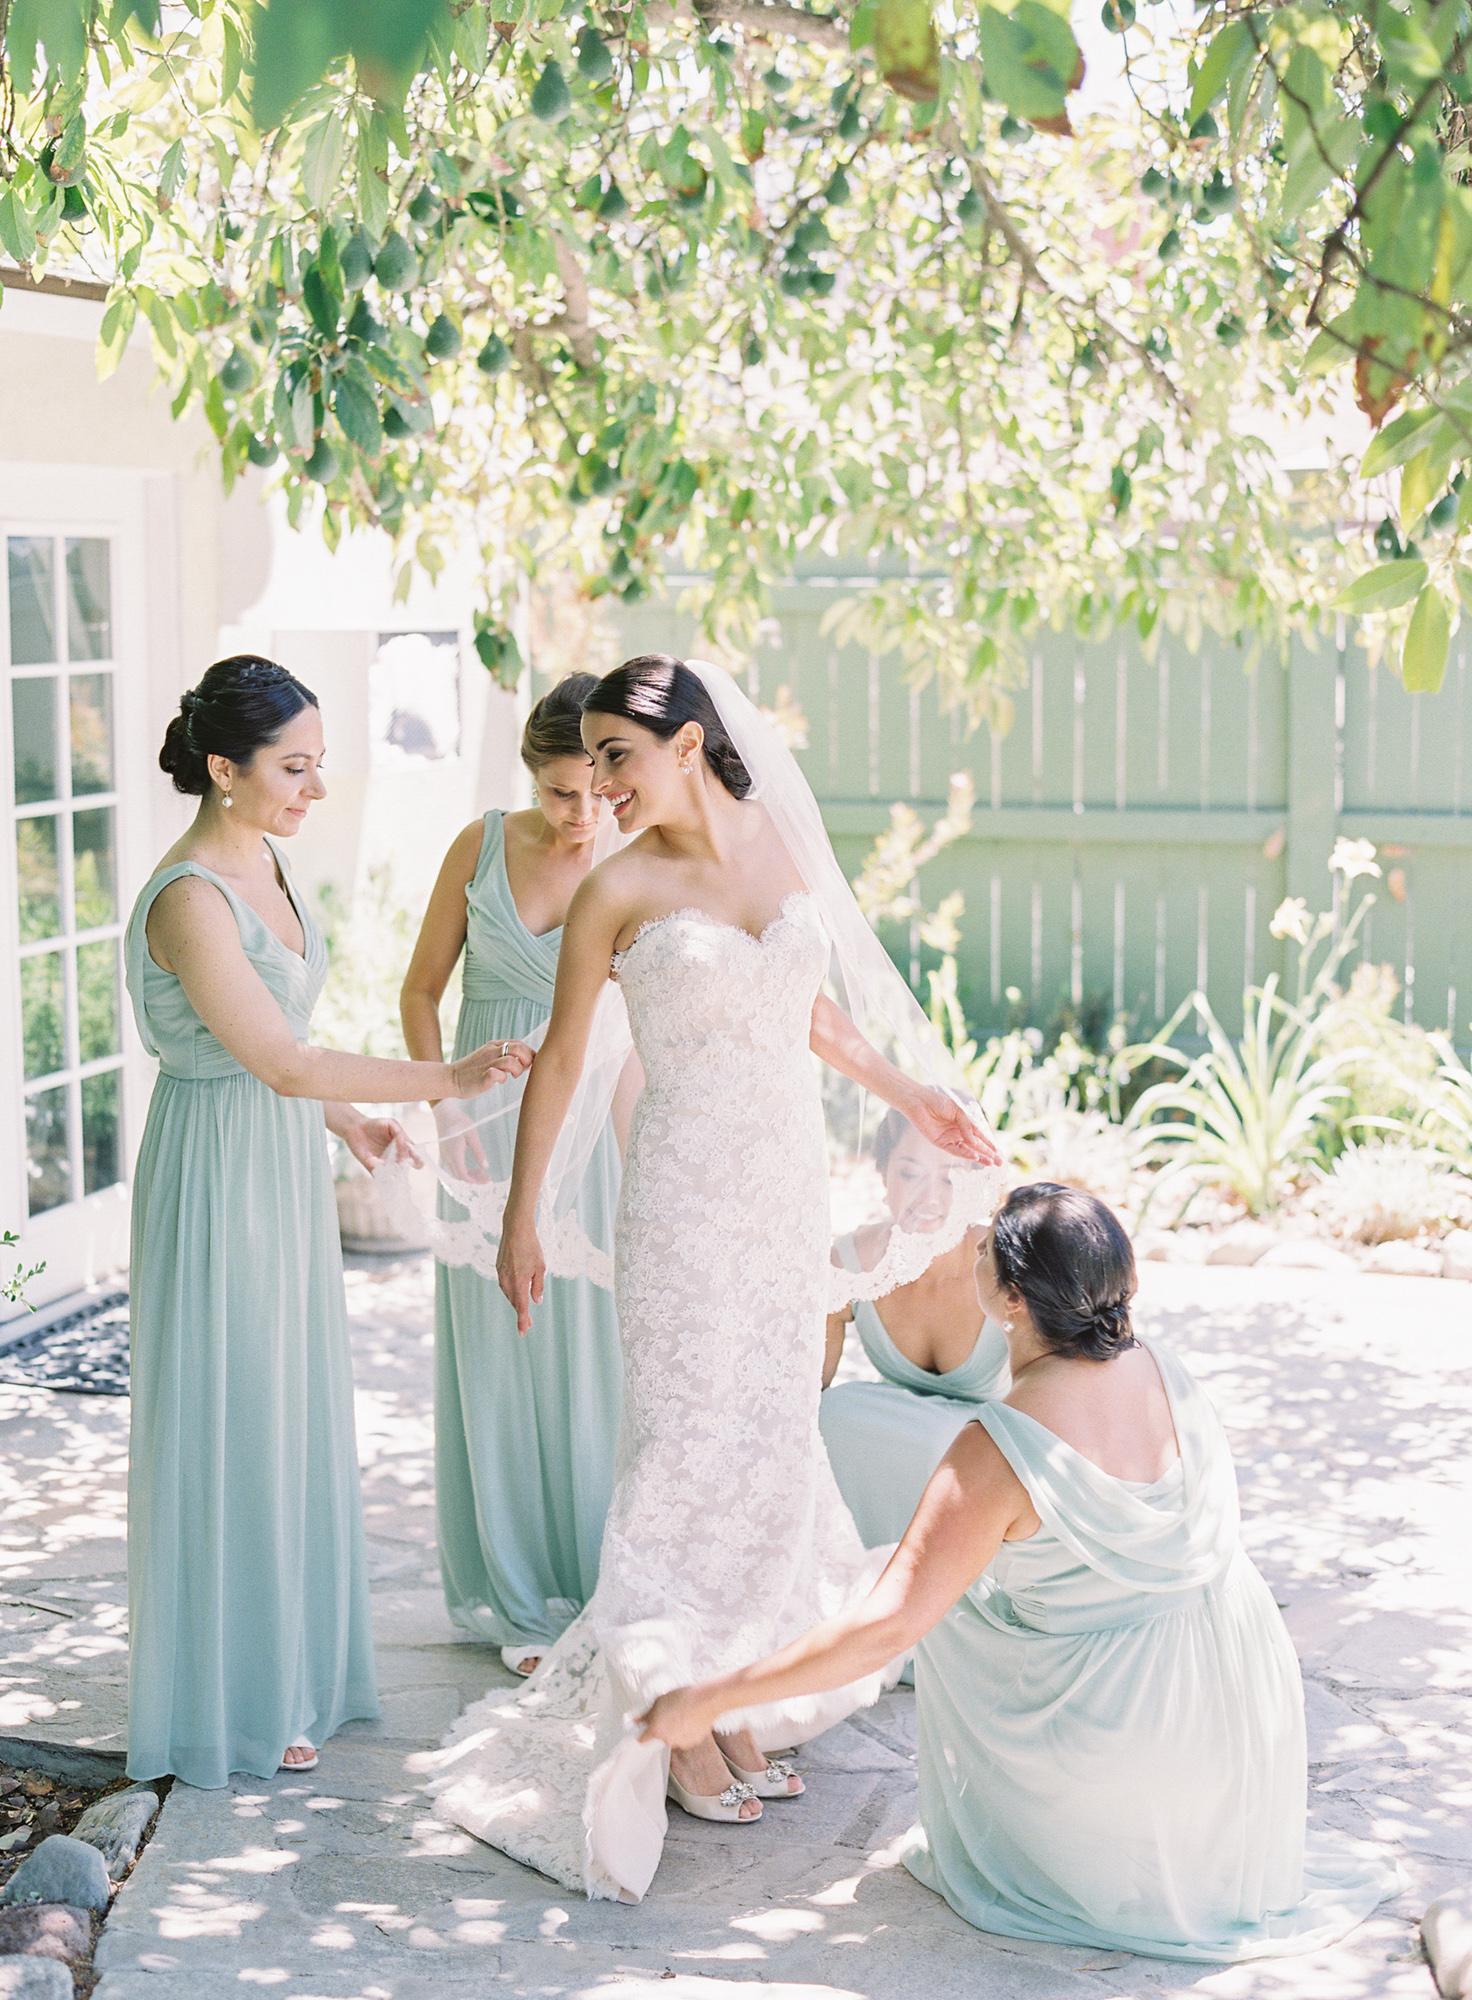 Gerry-Ranch-Wedding-Photography-Kristina-Adams-4.jpg